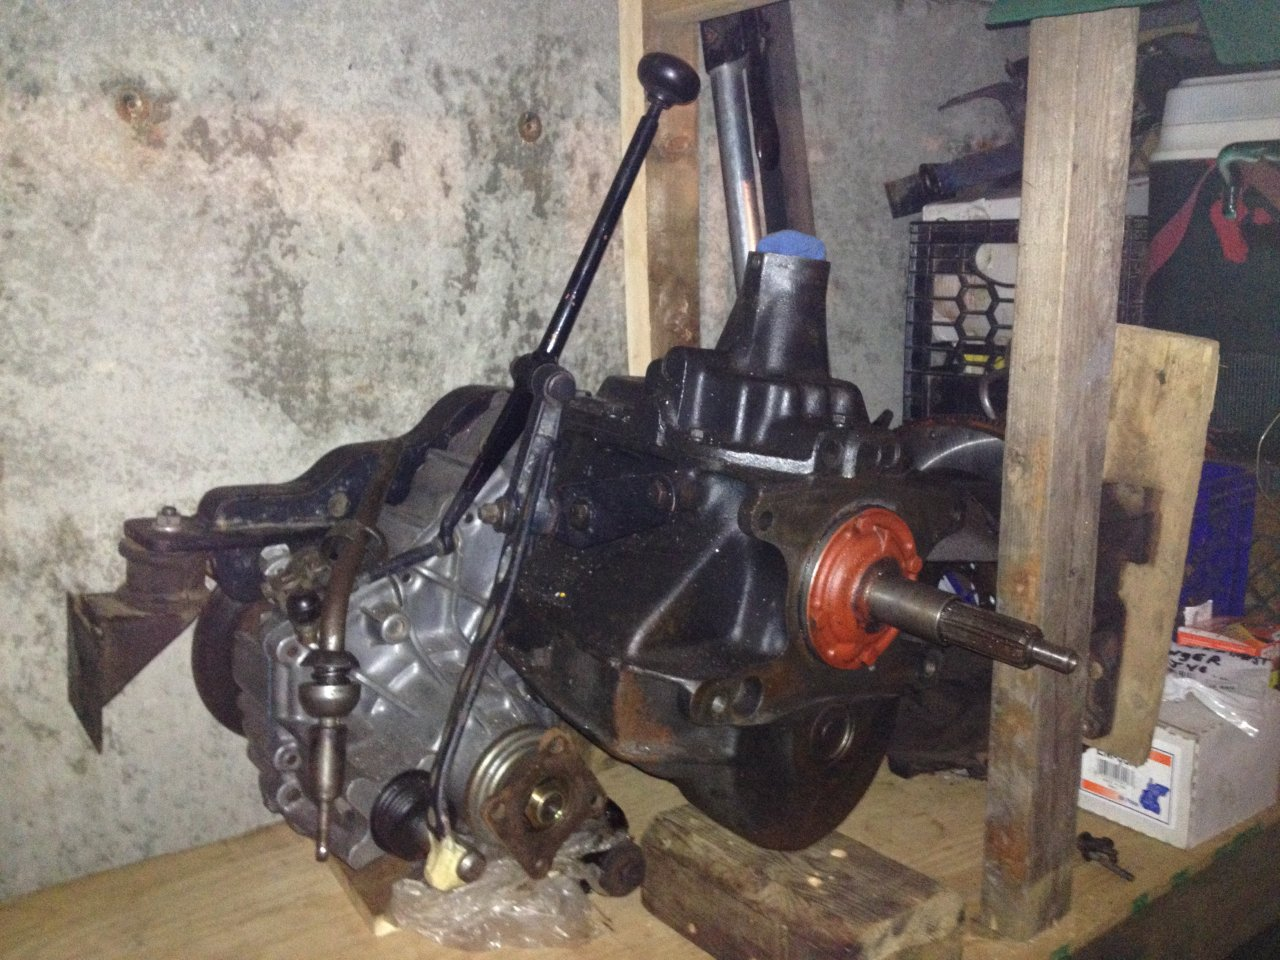 Transfer Case Parts >> craigslist - FJ40 1972 Parts for sell/ 86 Transmission / SM 420 Custom Conversion Transmission ...